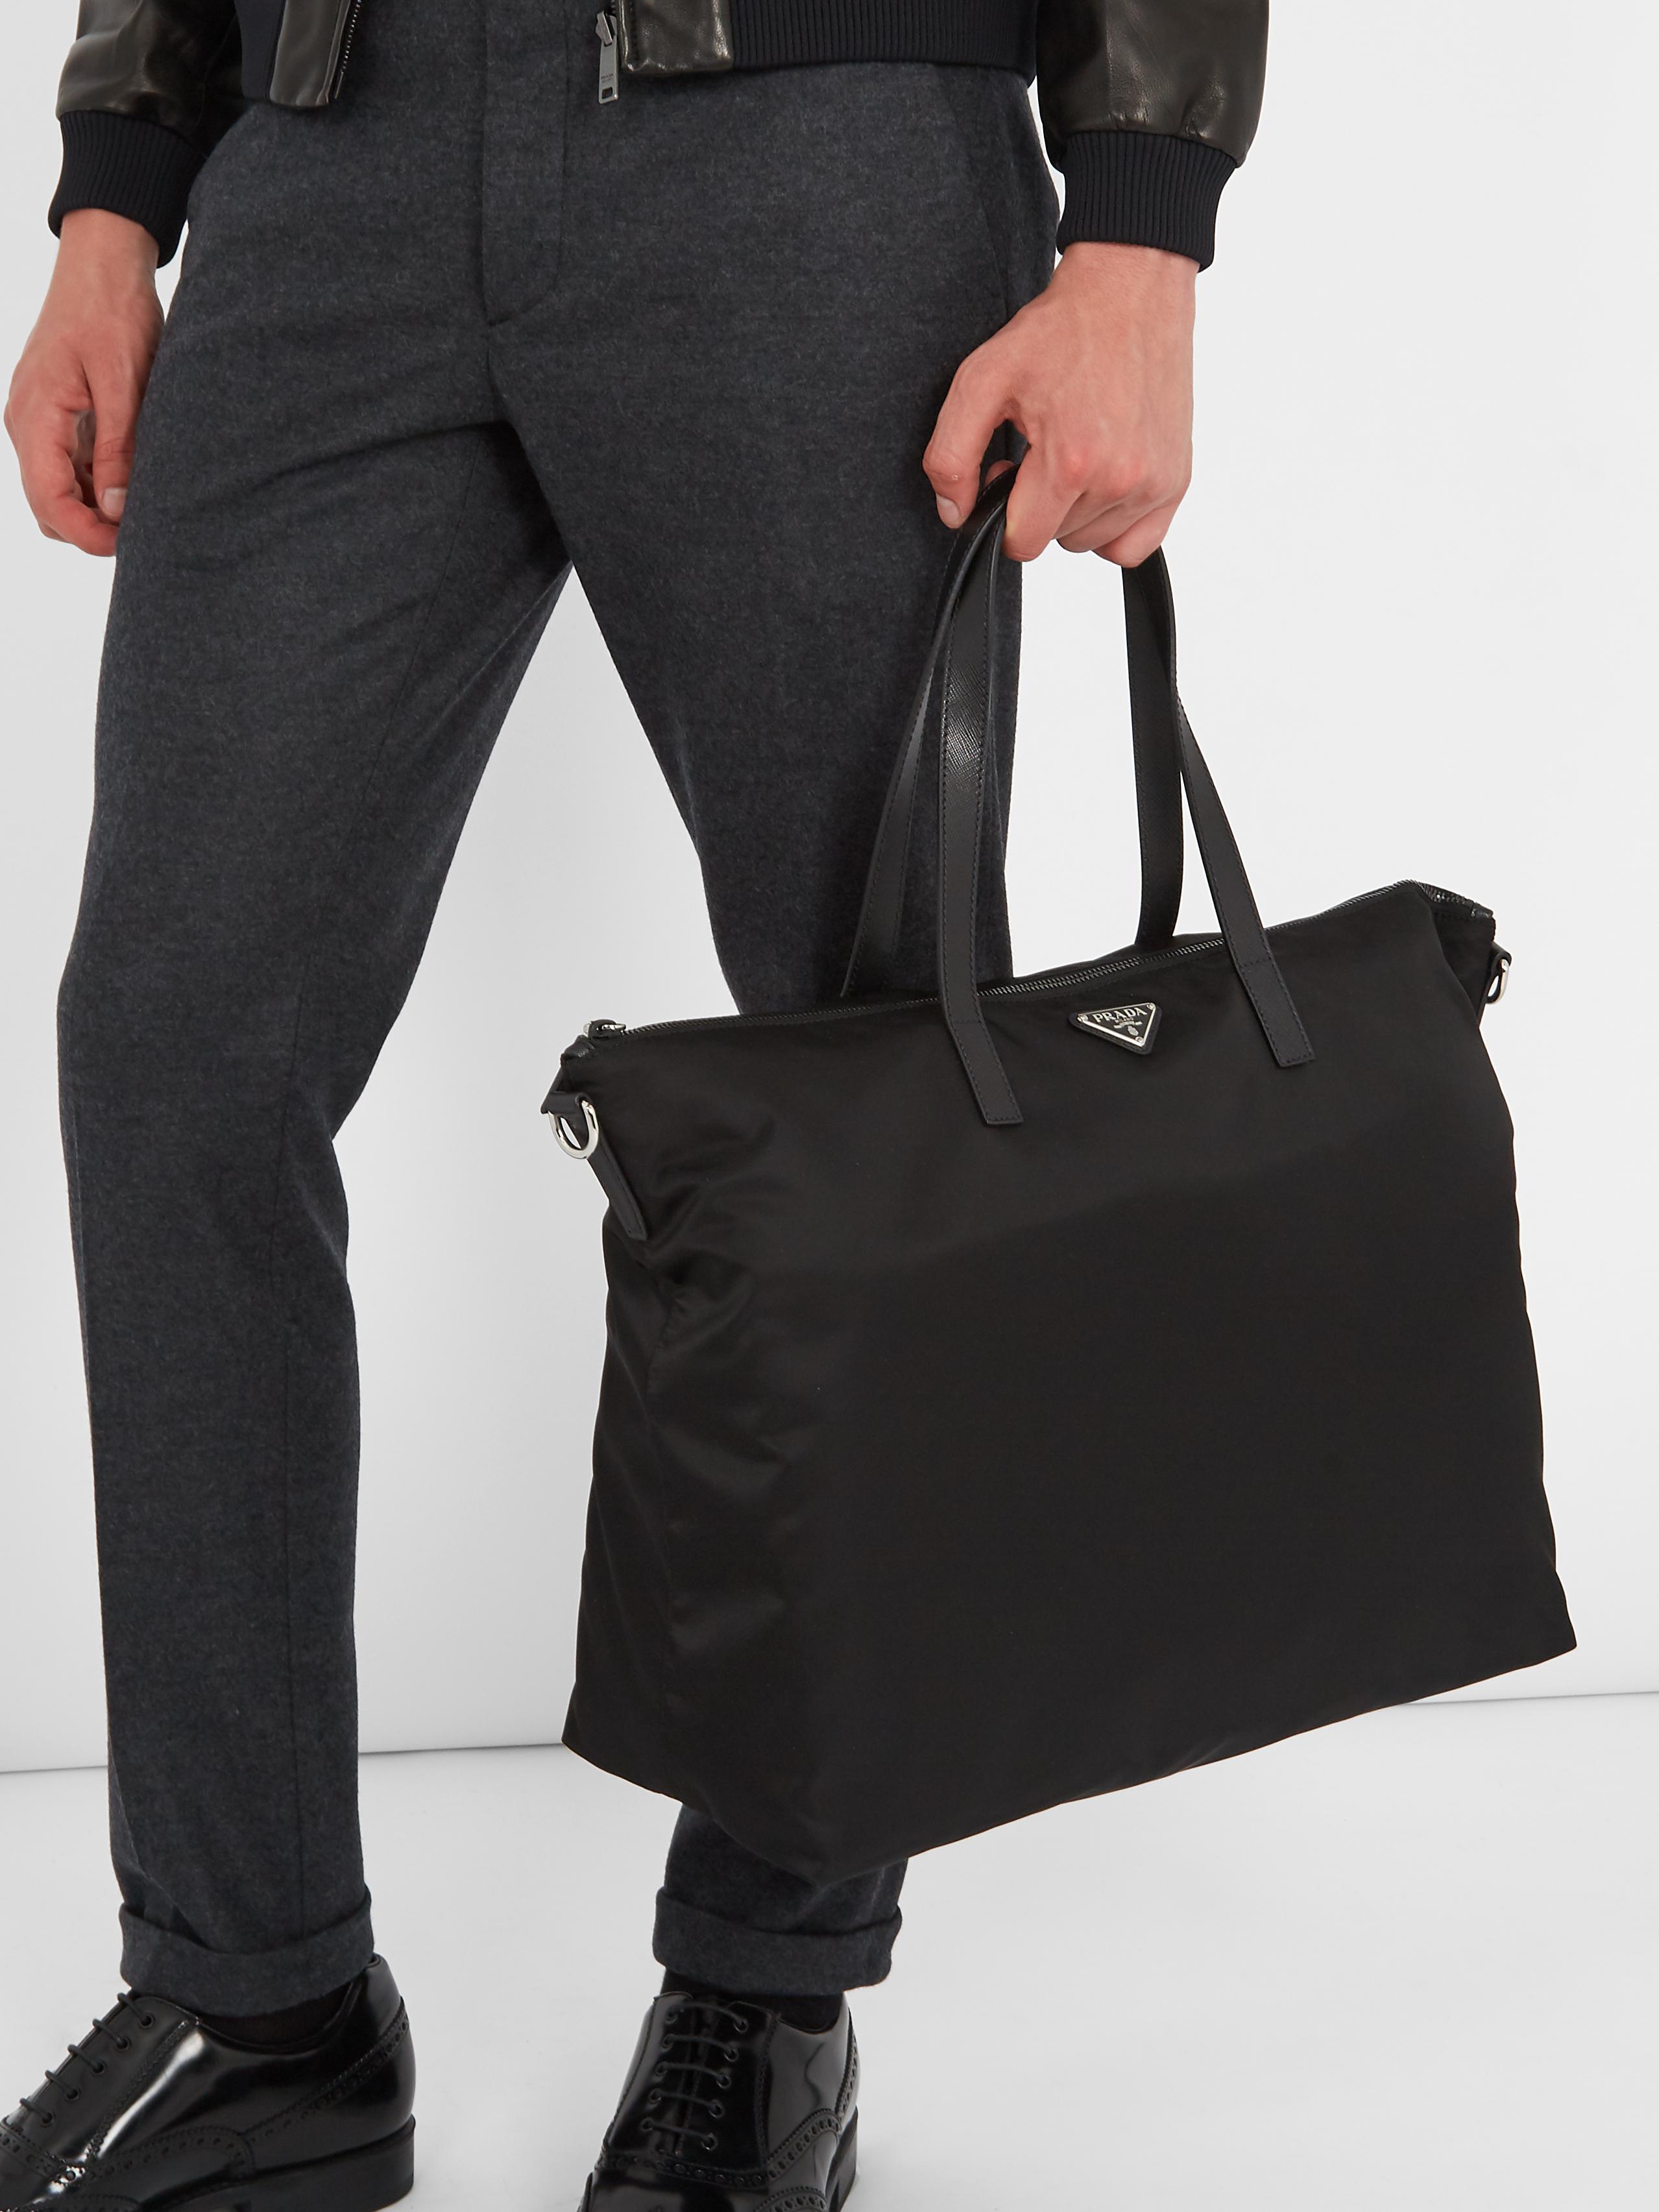 58688035efe832 Lyst - Prada Leather-trimmed Nylon Tote in Black for Men